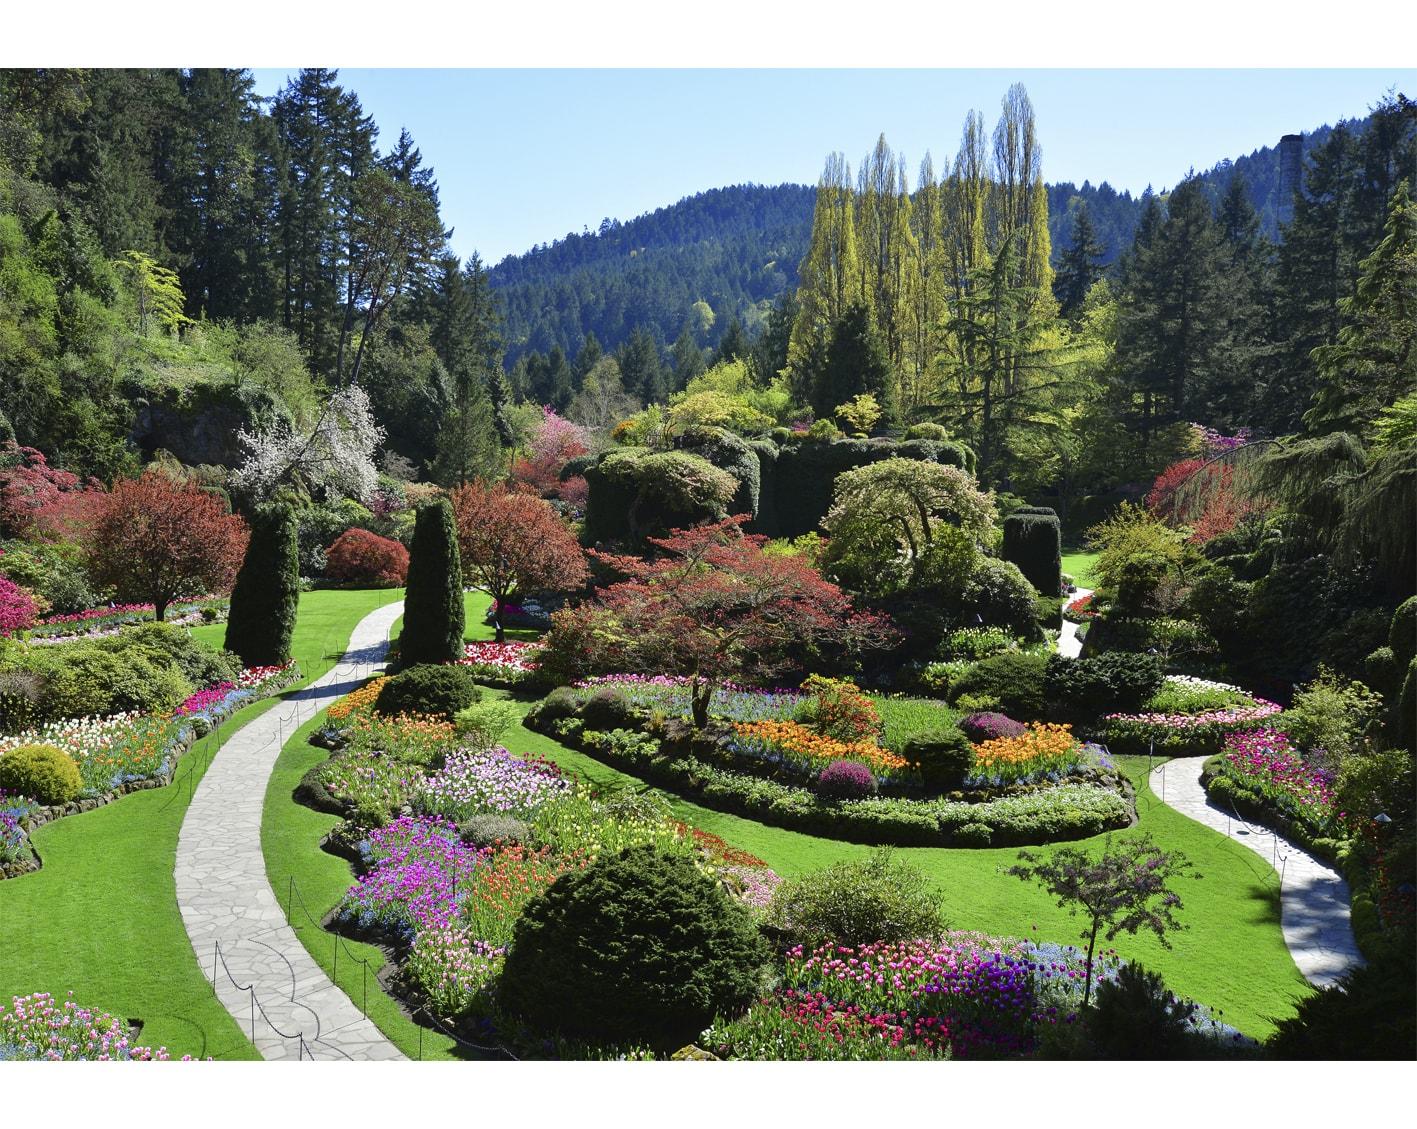 The Butchart Gardens. Credit: blog.canadatravelspecialists.com